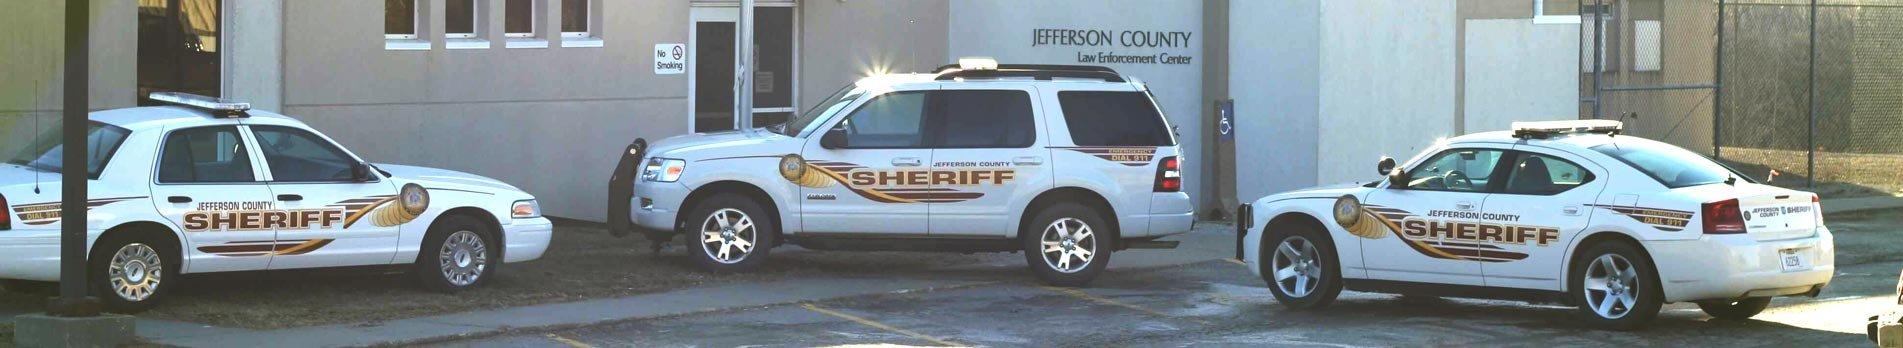 Jefferson County, Kansas Sheriff's Office